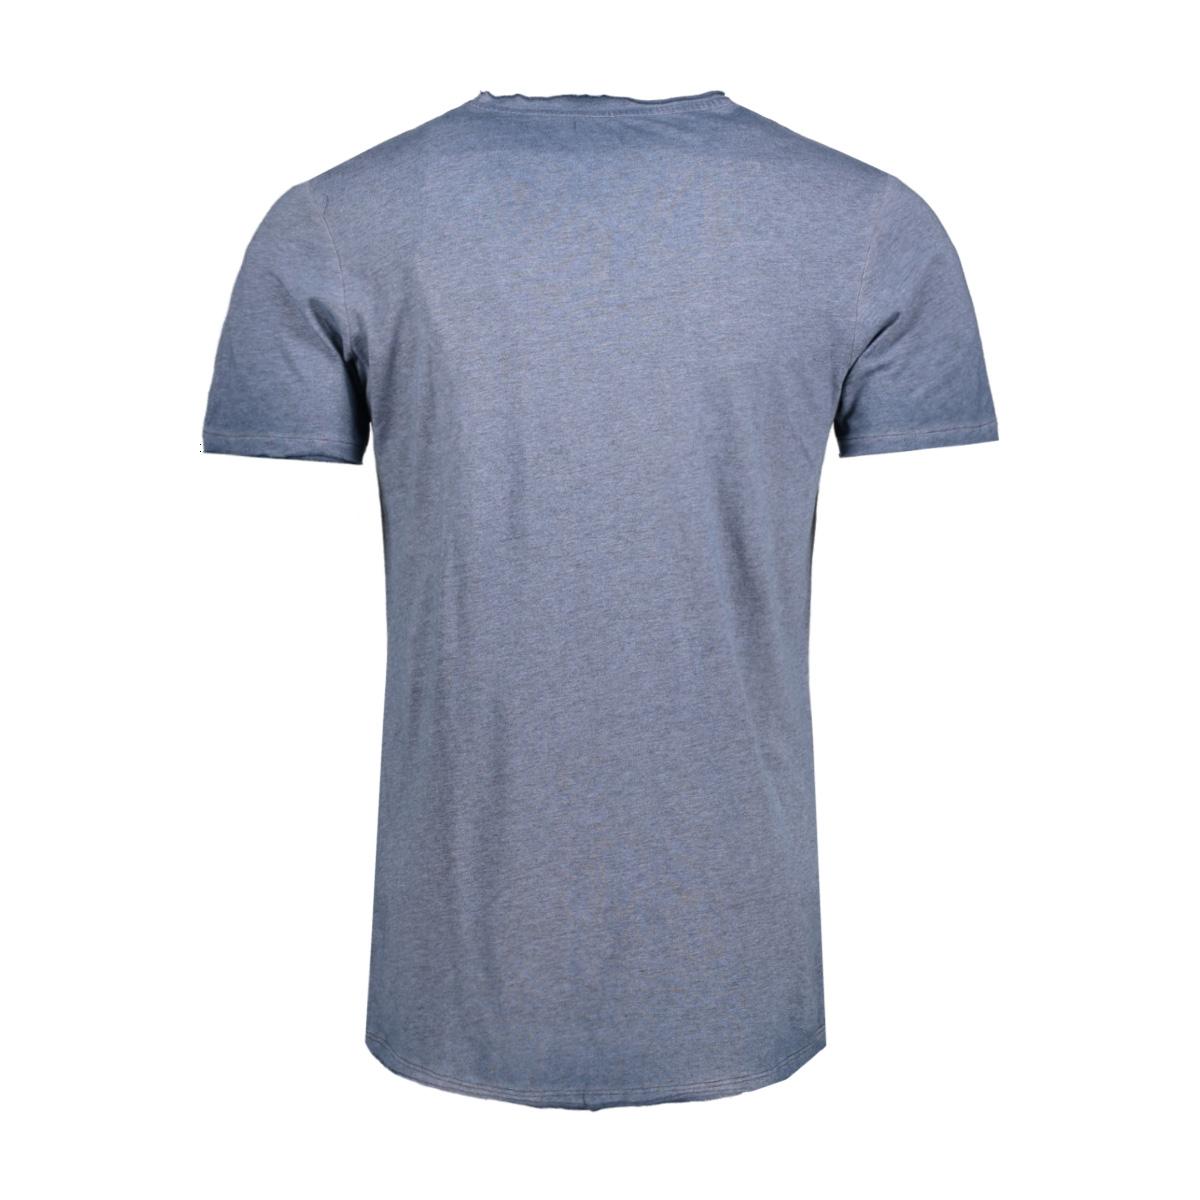 jjvjack ss tee crew neck noos 12103171 jack & jones t-shirt mood indigo